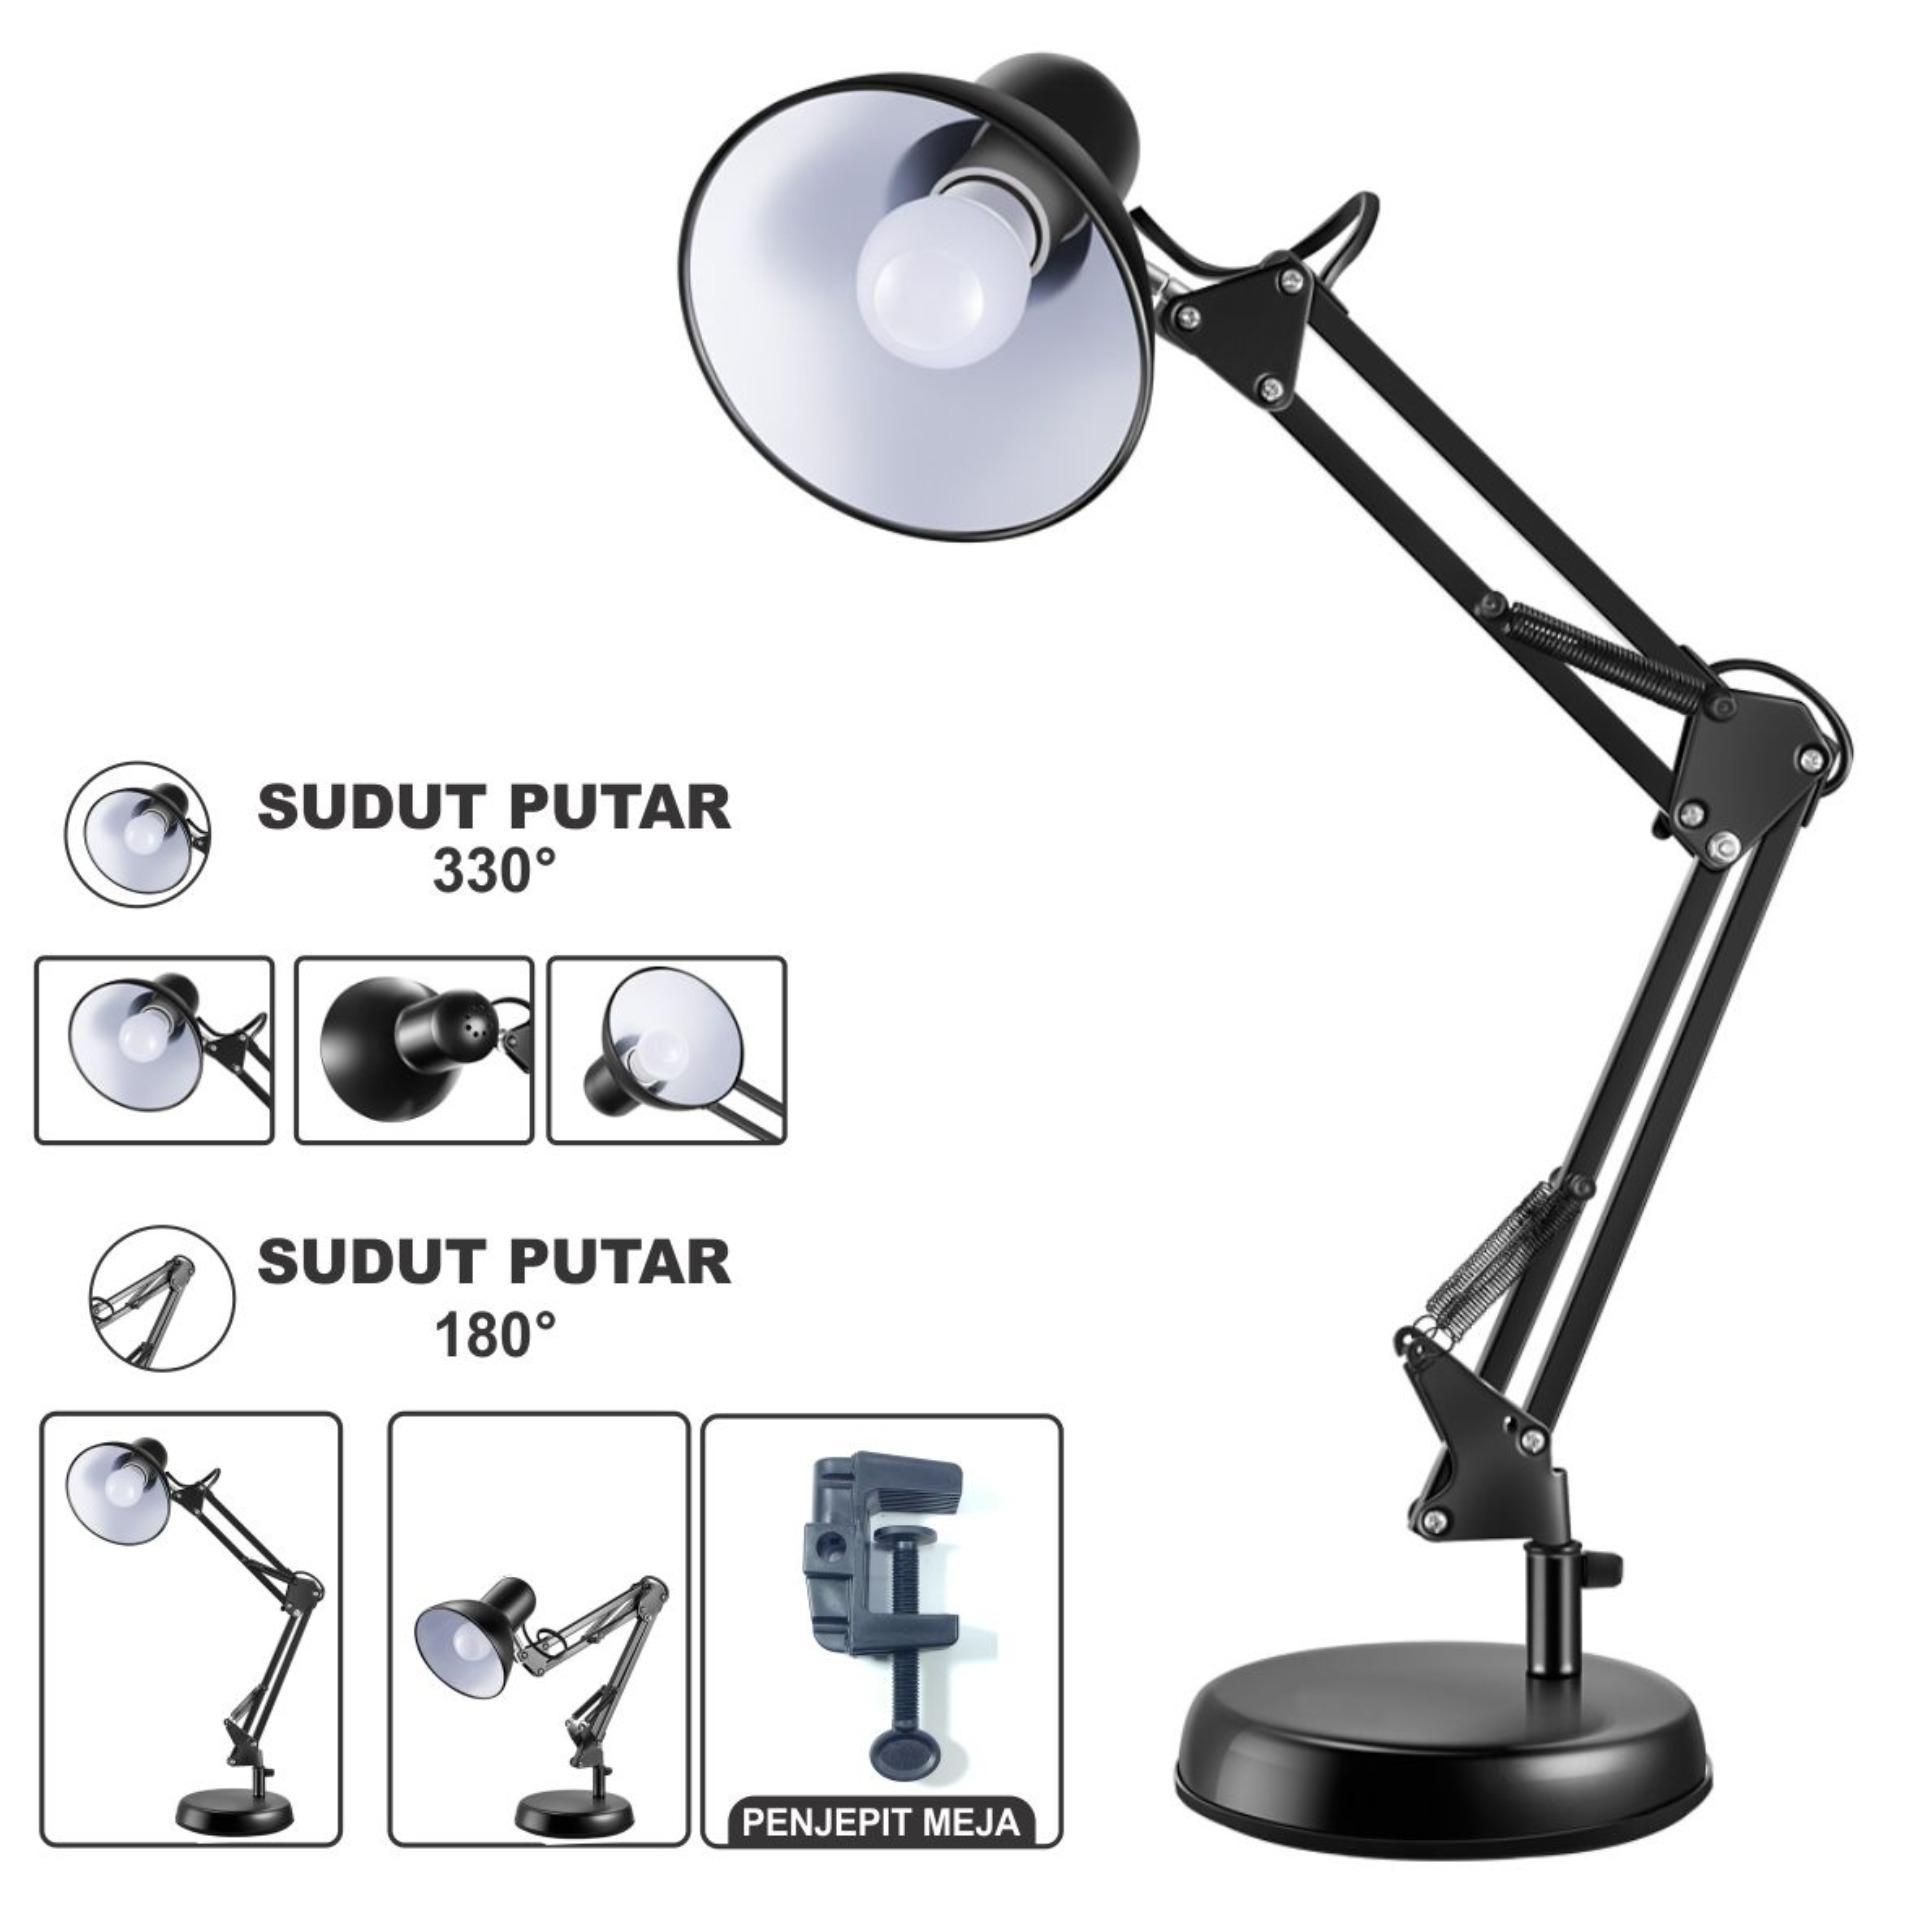 WEITECH LAMPU MEJA/LAMPU BACA GX-810